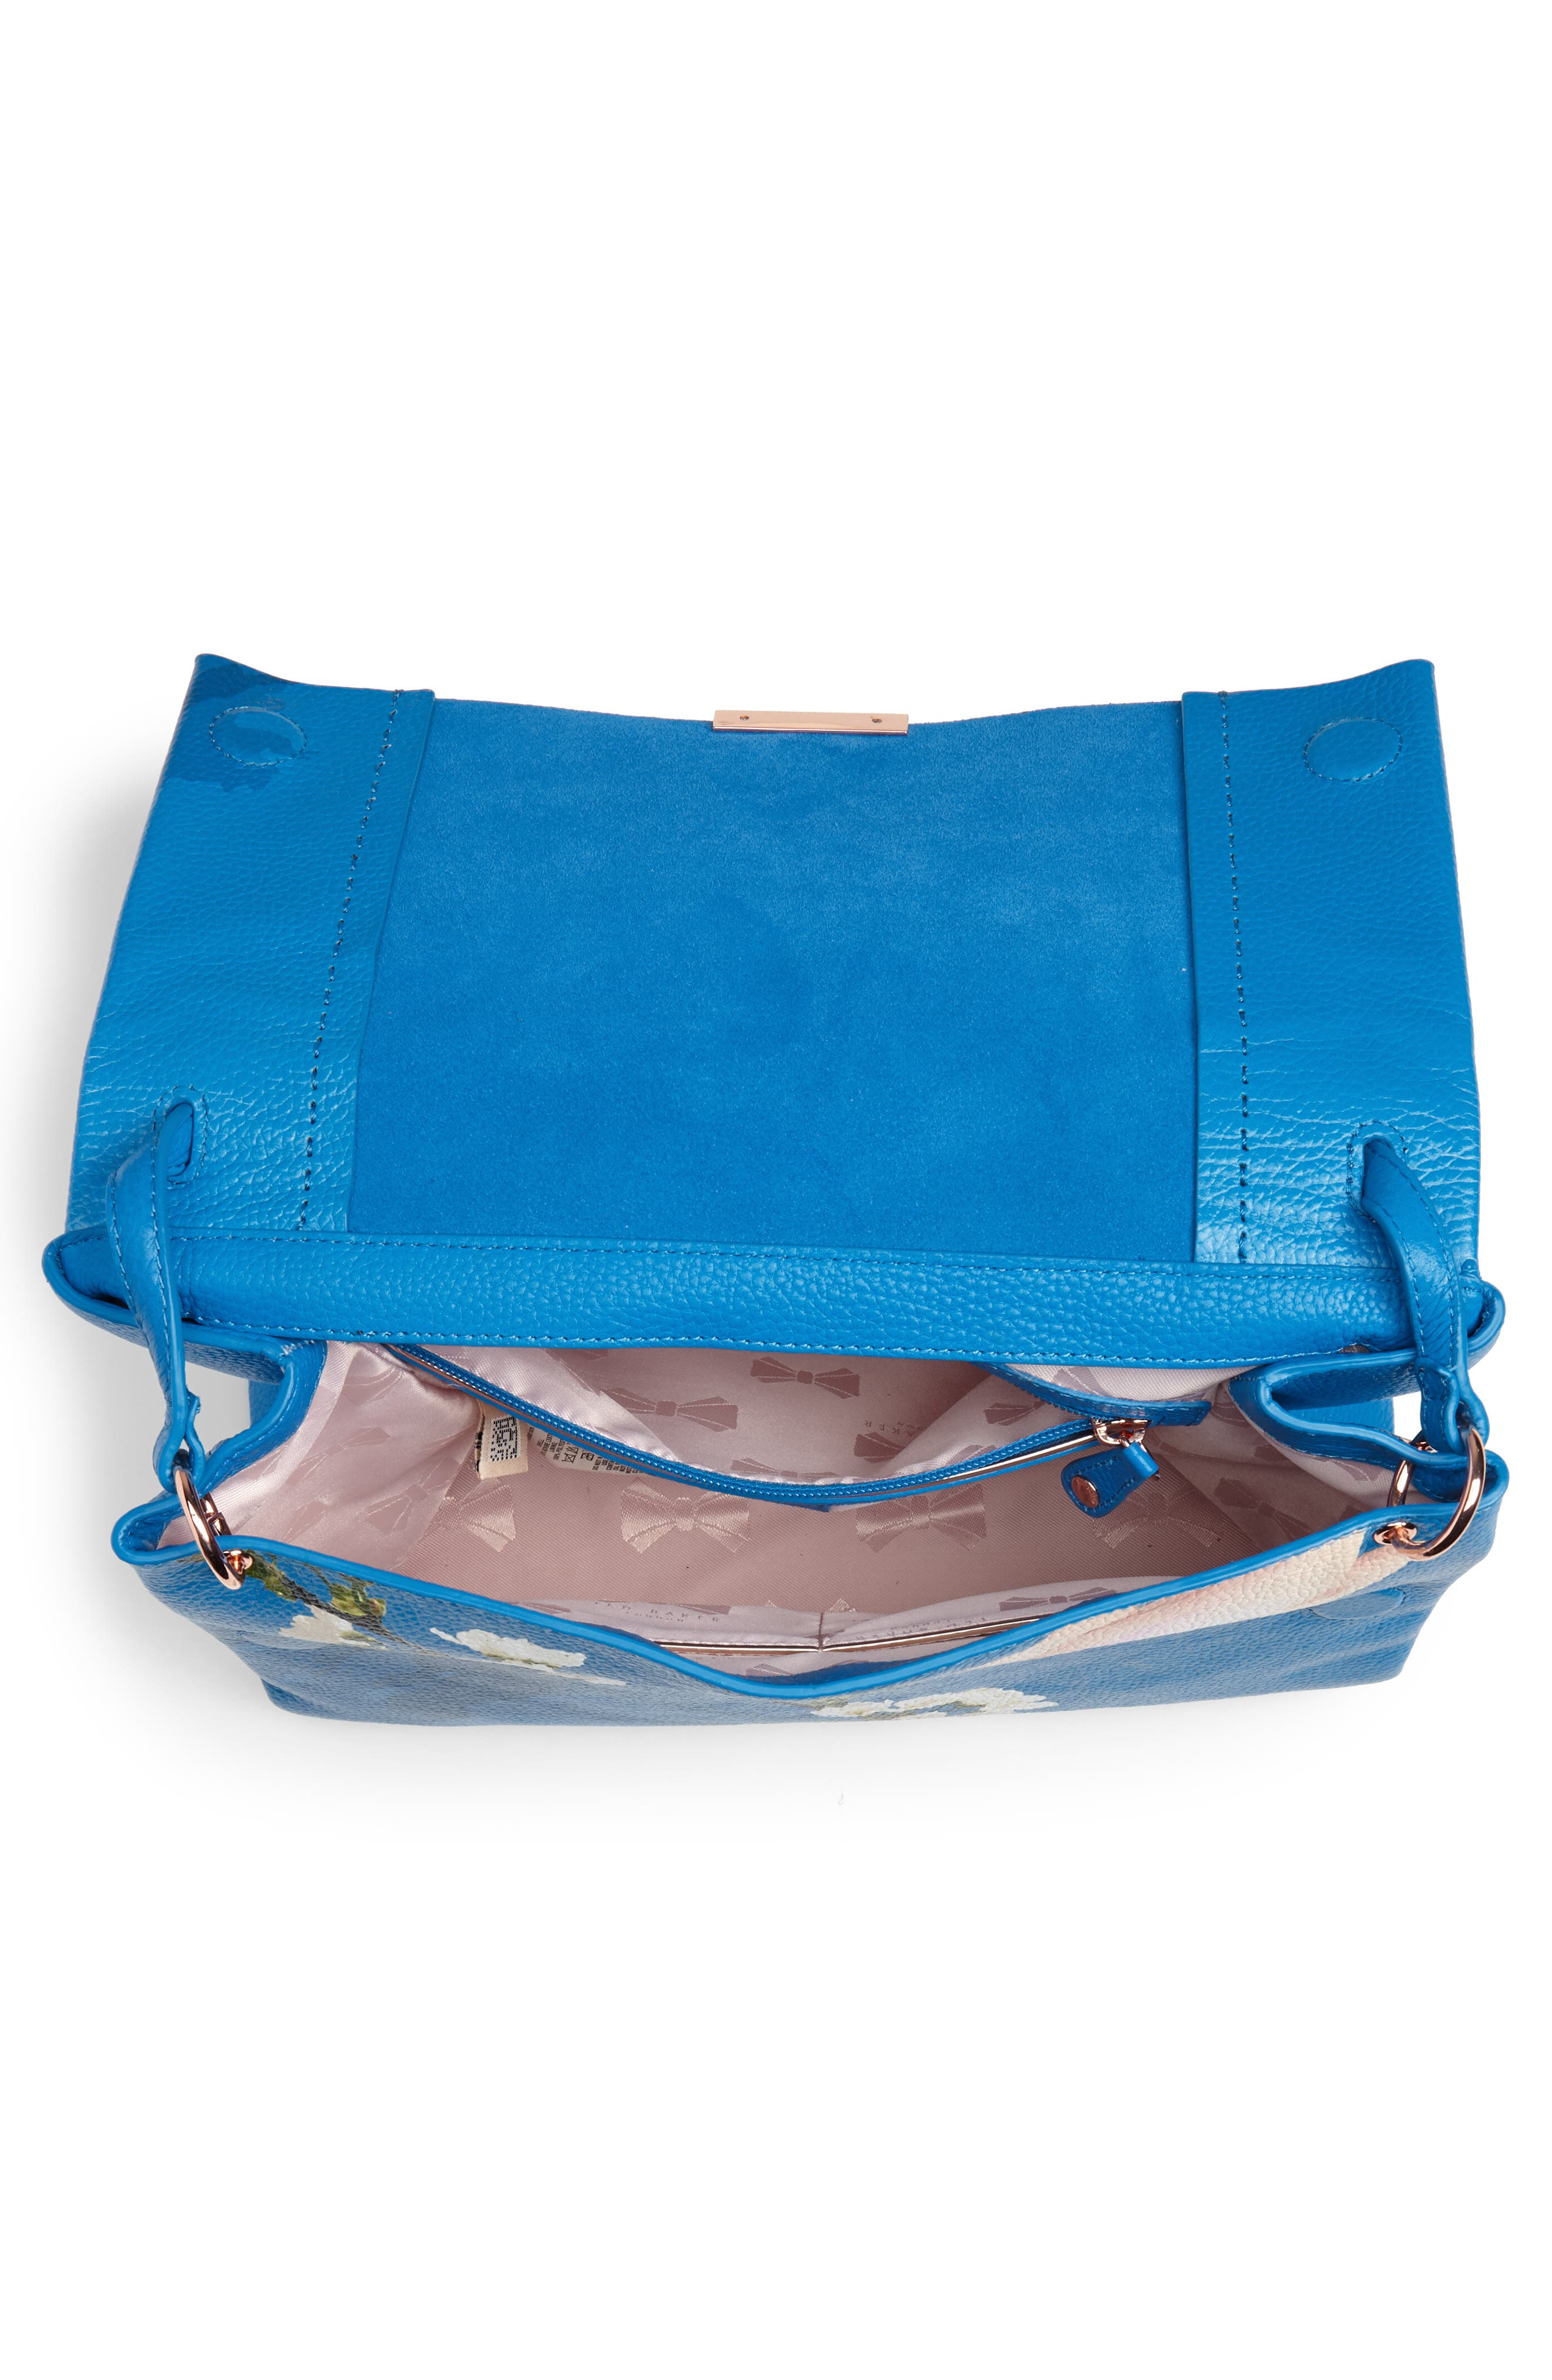 Heeidi Harmony Print Leather Shoulder Bag,                             Alternate thumbnail 4, color,                             Bright Blue